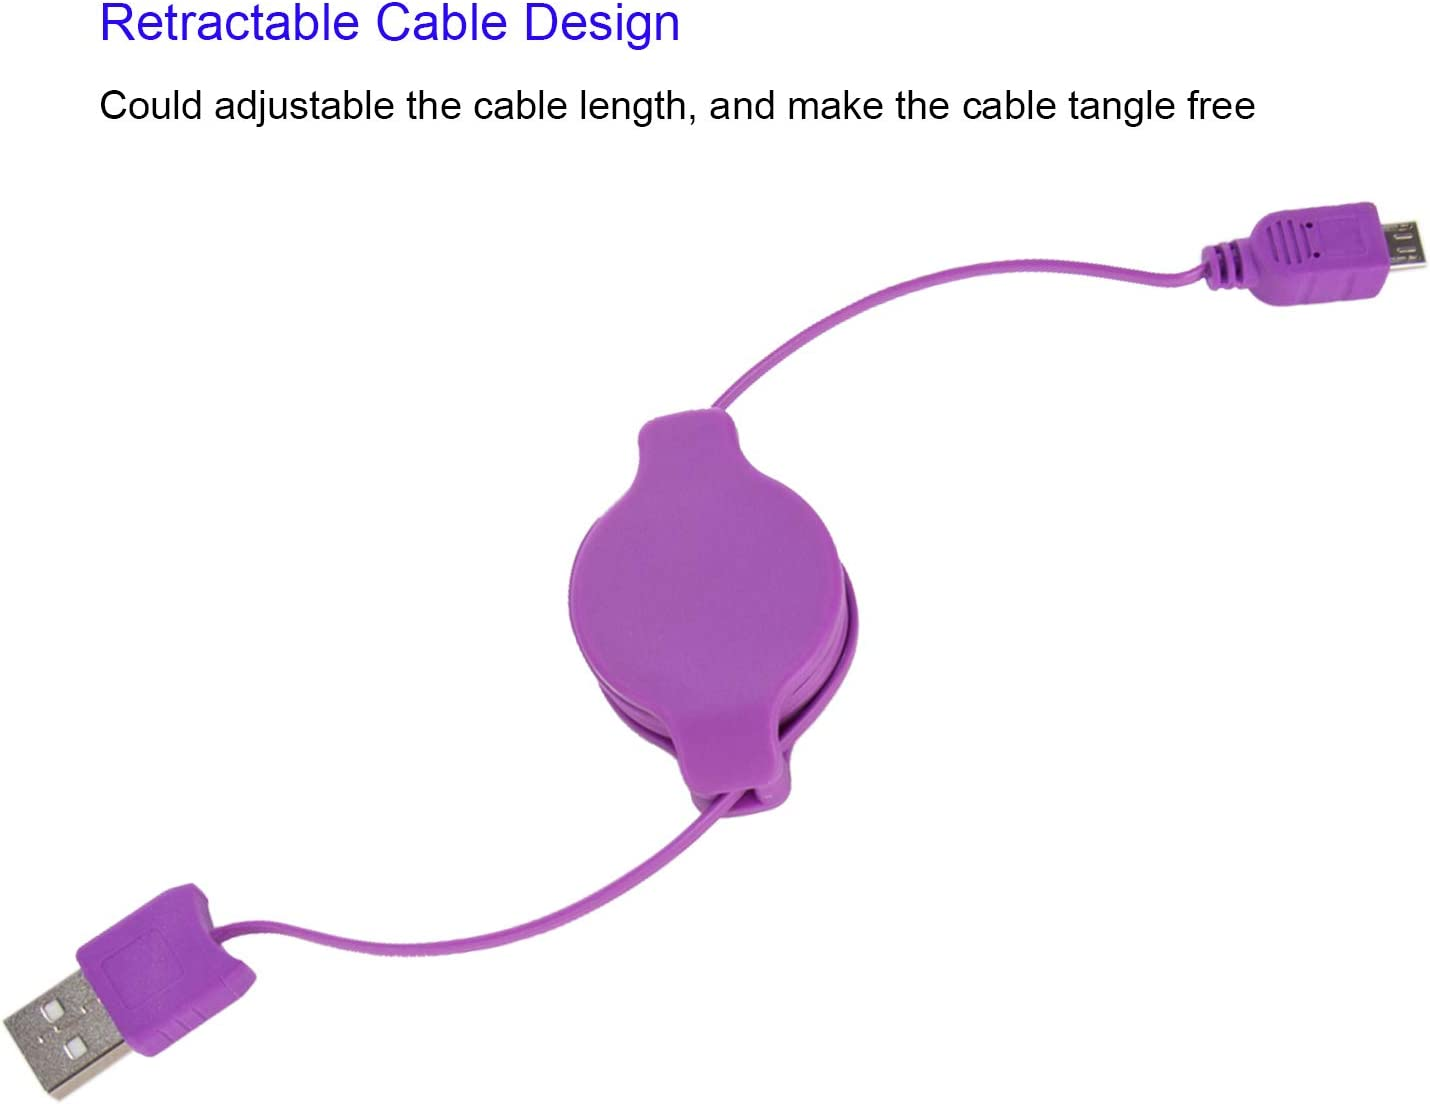 X30 D1354 X30T E3142 X30 E1326 X30 E1320 Retractable Charge Cable and 13.3 Inch Laptop Sleeve for Toshiba Portege A30 D1300ED X30 E1324 X30 D1356 X30 D1352 X30 E1322 X30 E1346 X30T E3144